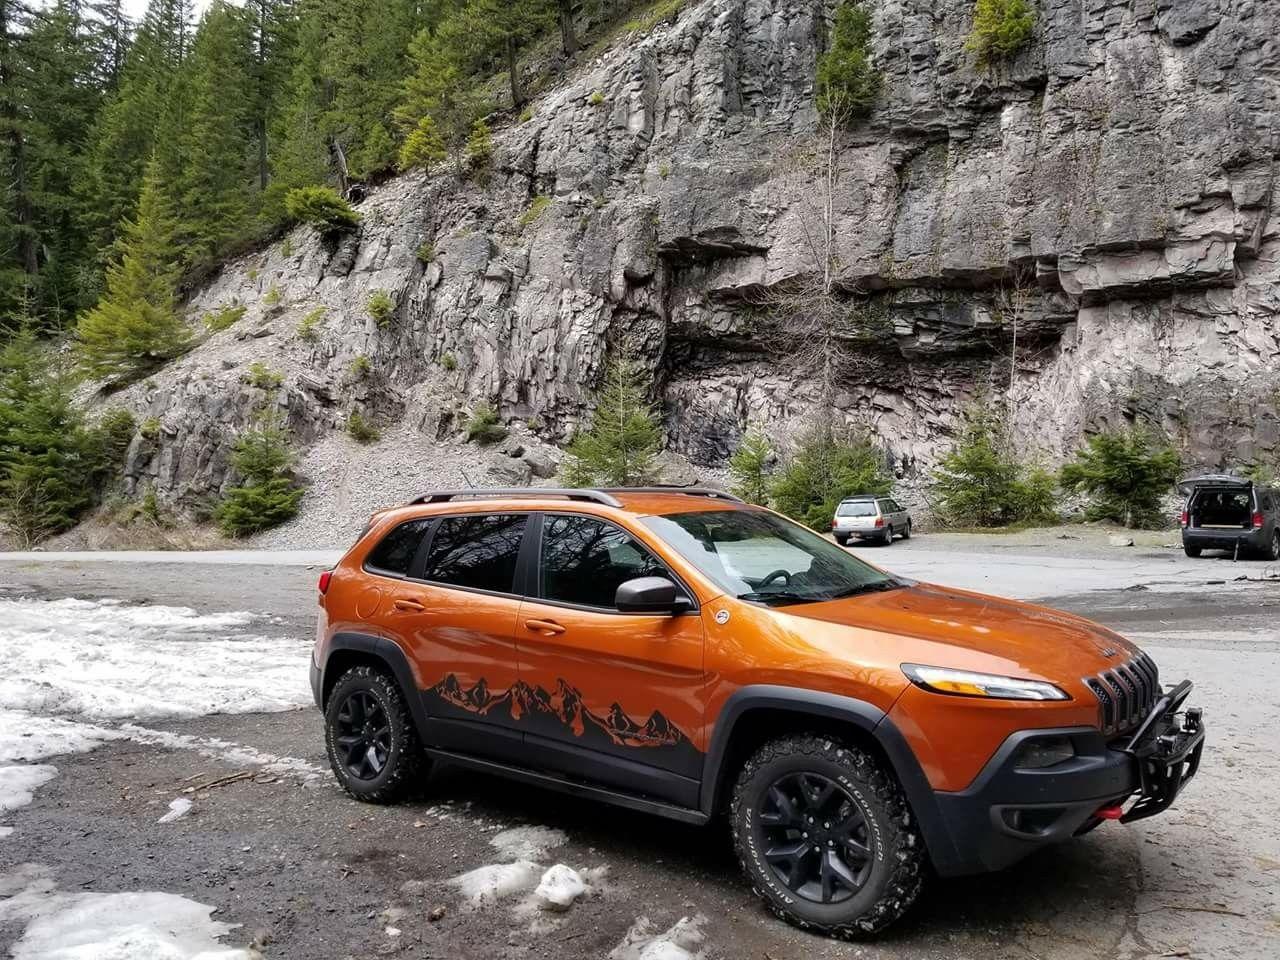 Jeep Cherokee Trailhawk 4x4 Kl Jeep Cherokee Trailhawk Cherokee